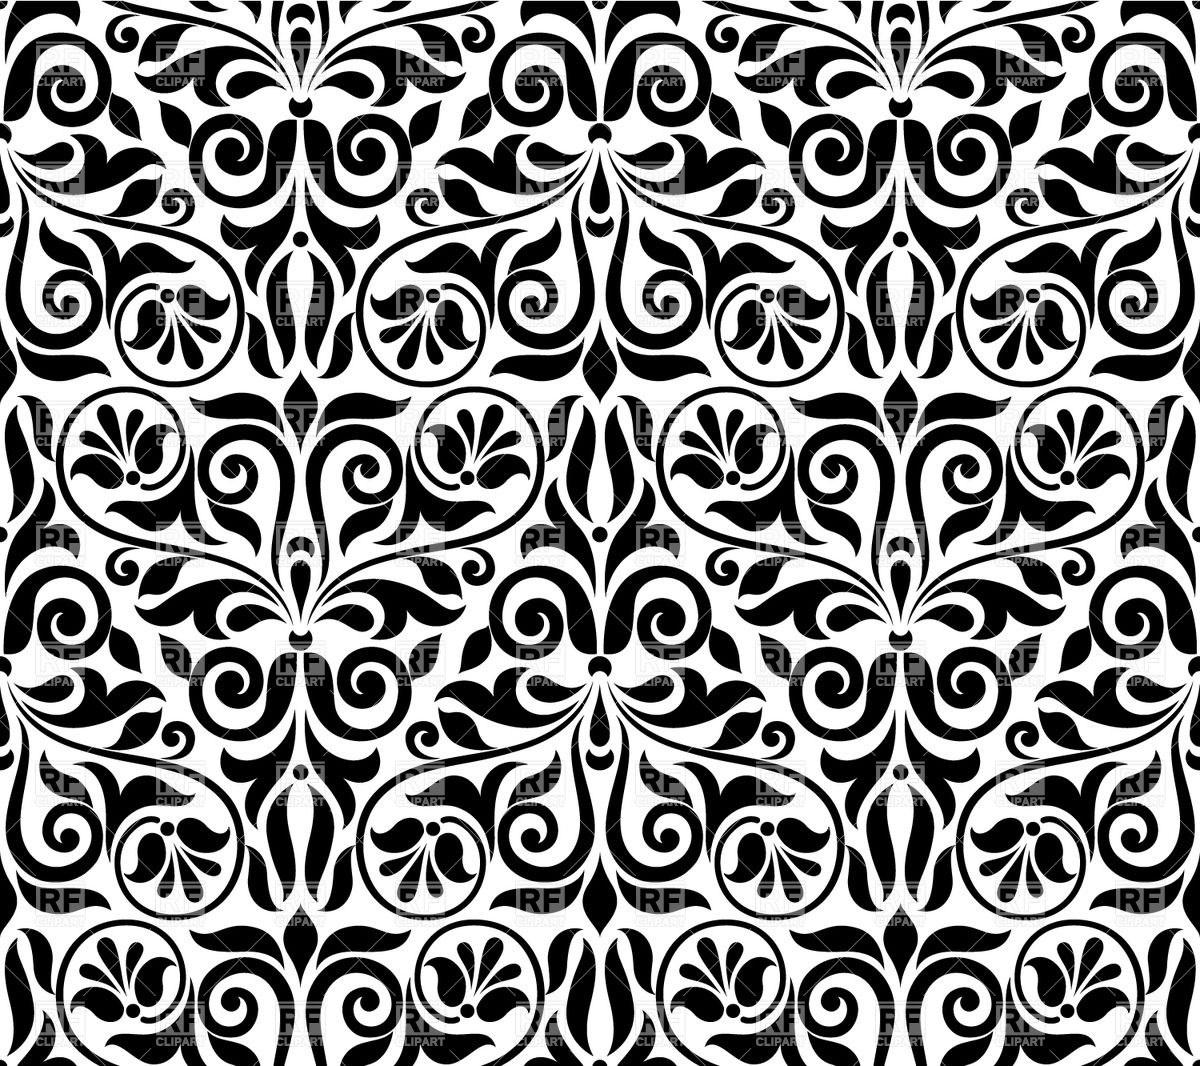 Damask pattern clipart 2 » Clipart Portal.